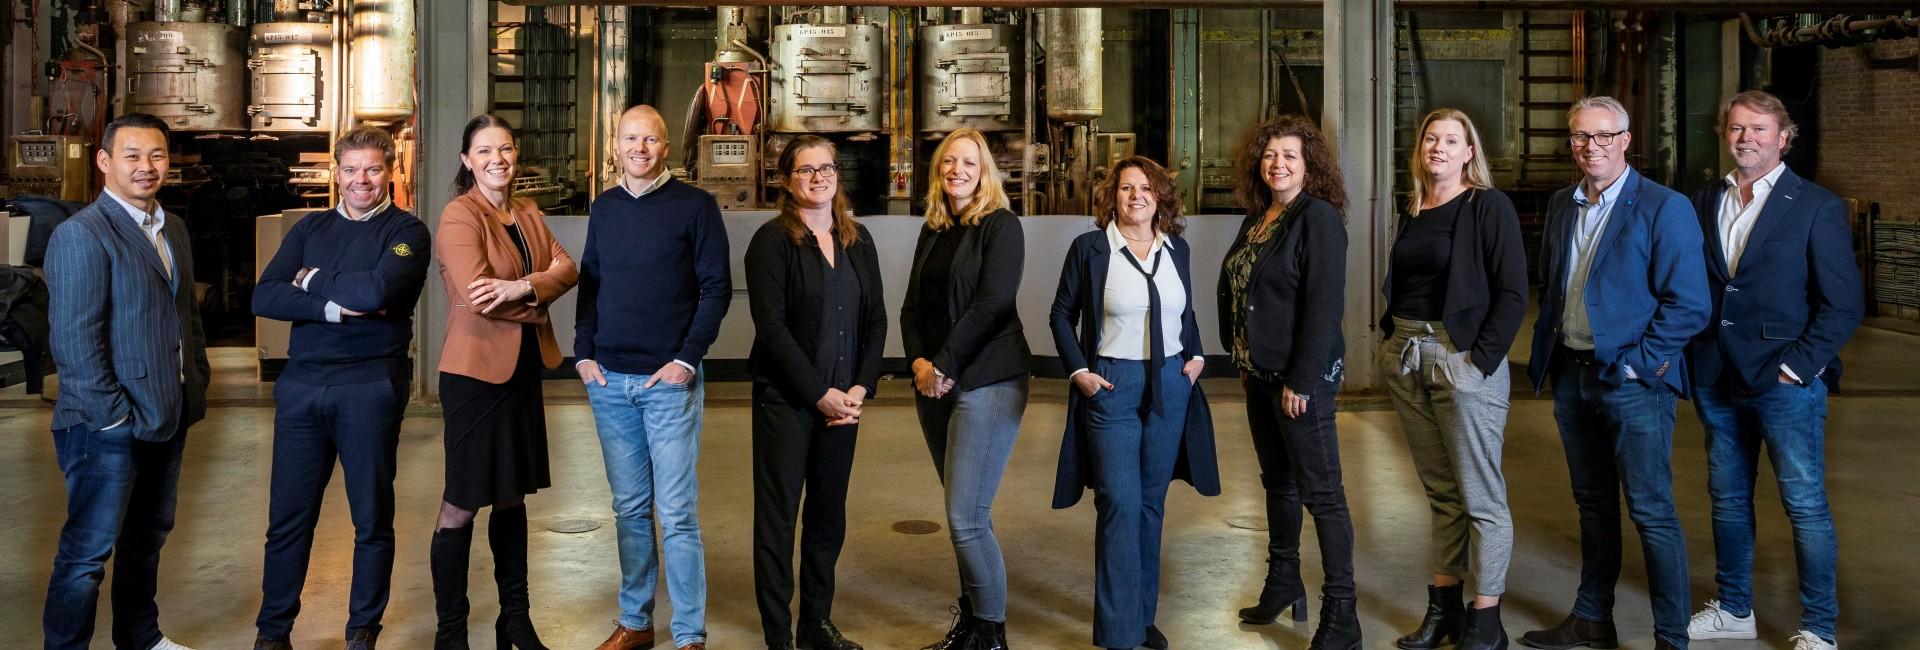 Hypotheekadvies team Tilburg